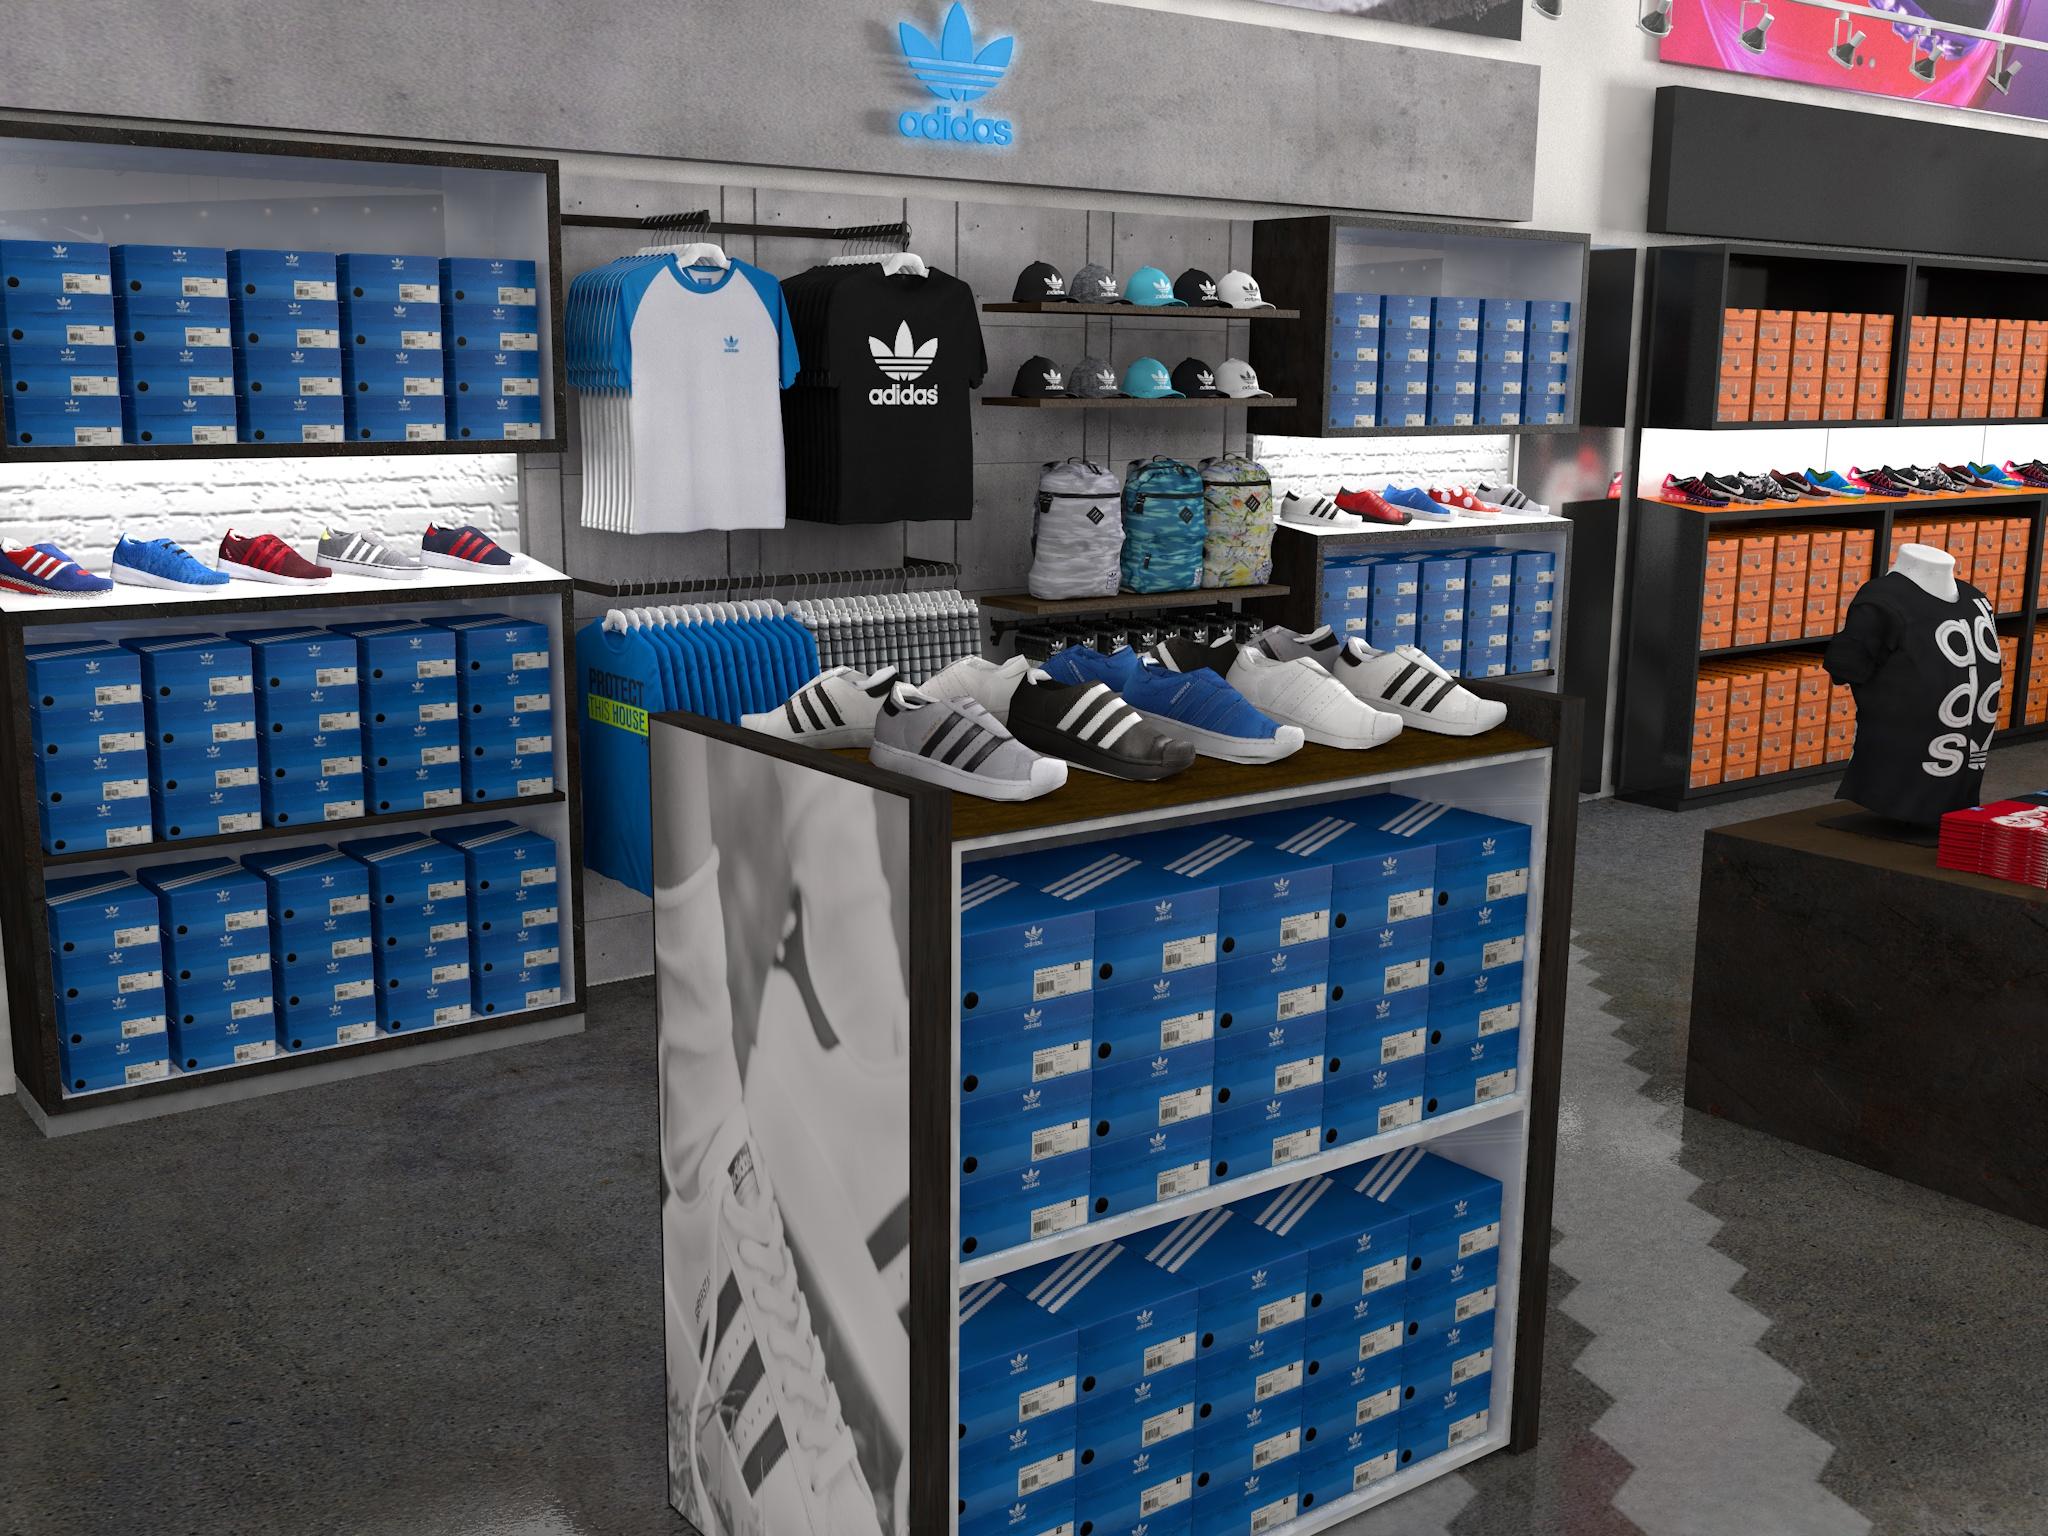 Adidas WSS Shop